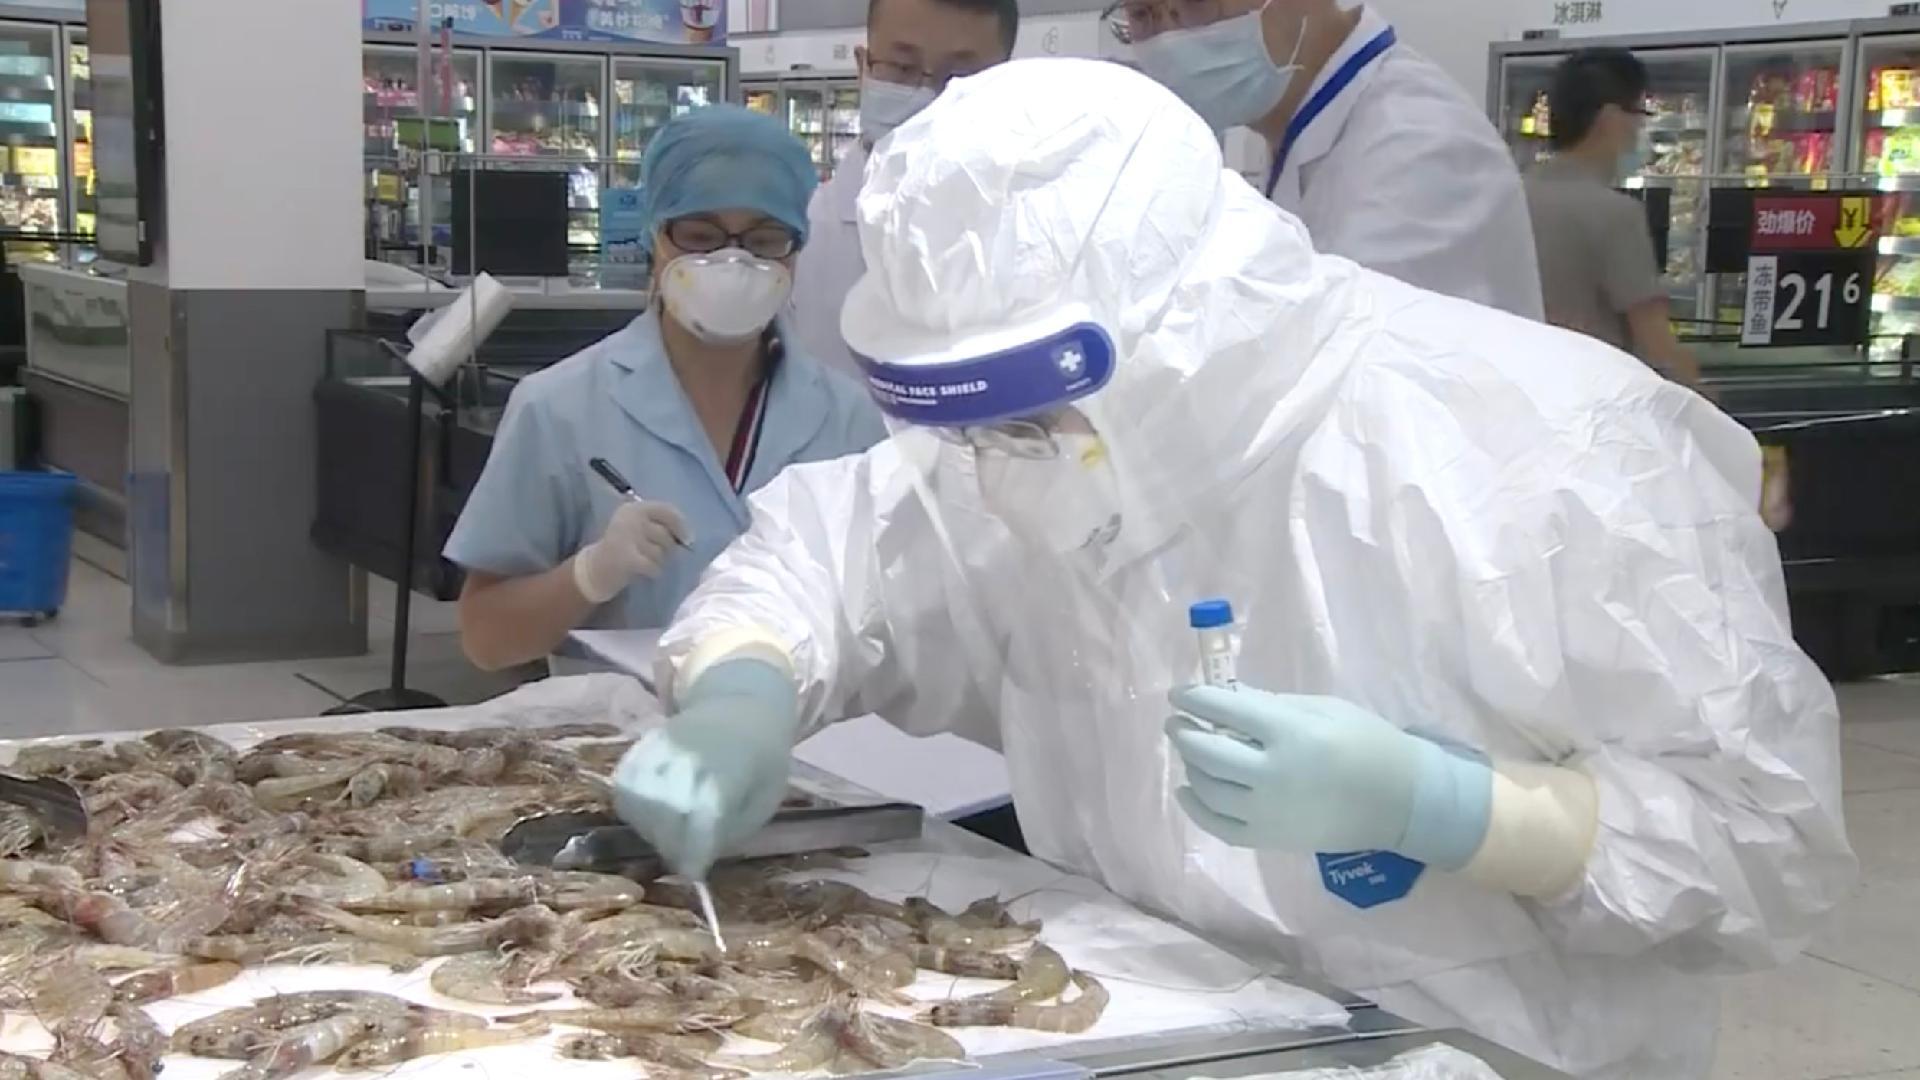 Chinese customs detect coronavirus in frozen South American shrimps - CGTN